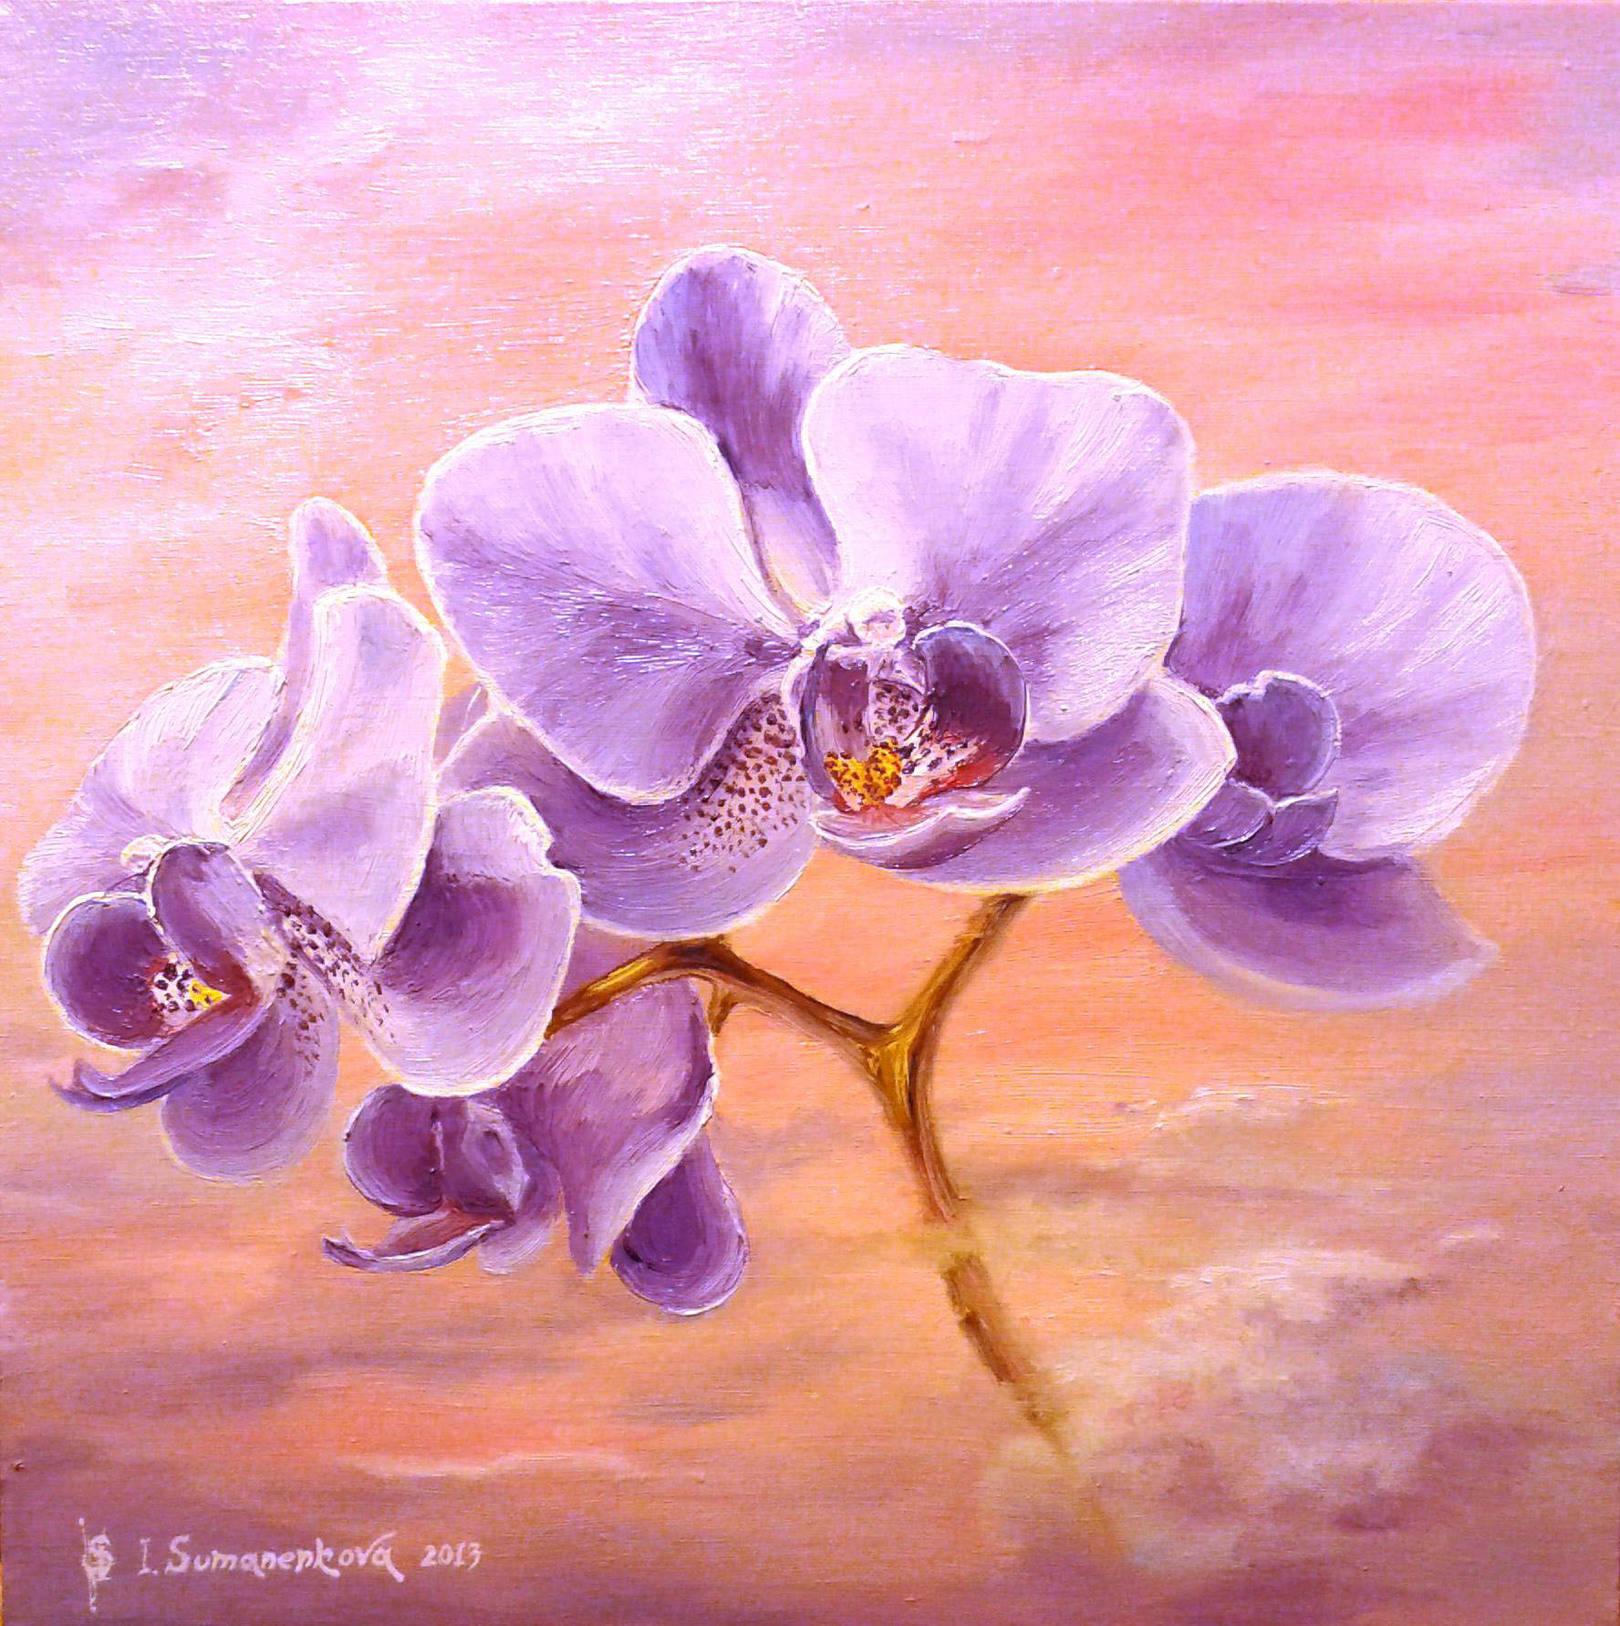 Орхидеи на рассвете / Orchids at sunset 45 x 45 cм, холст, масло, 2013 г